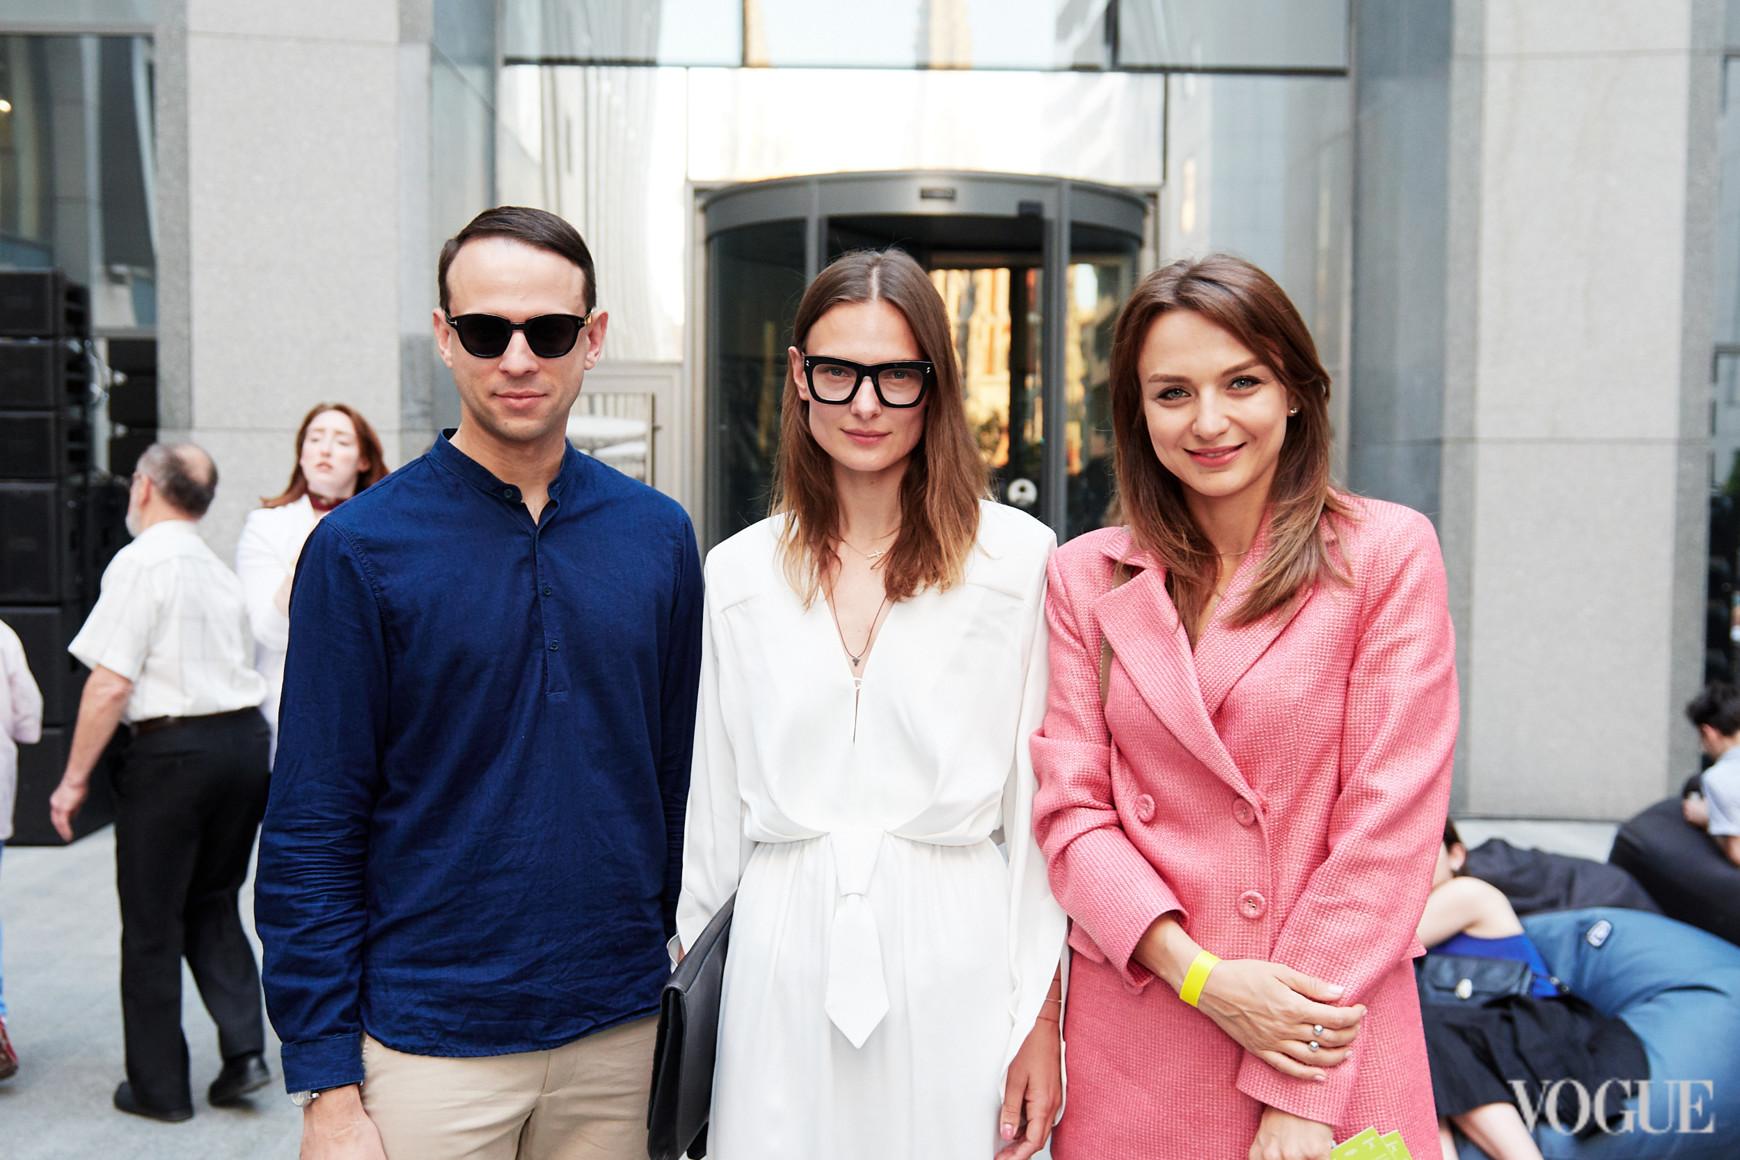 Павел Орлов, Татьяна Рубан и Алена Масюткина